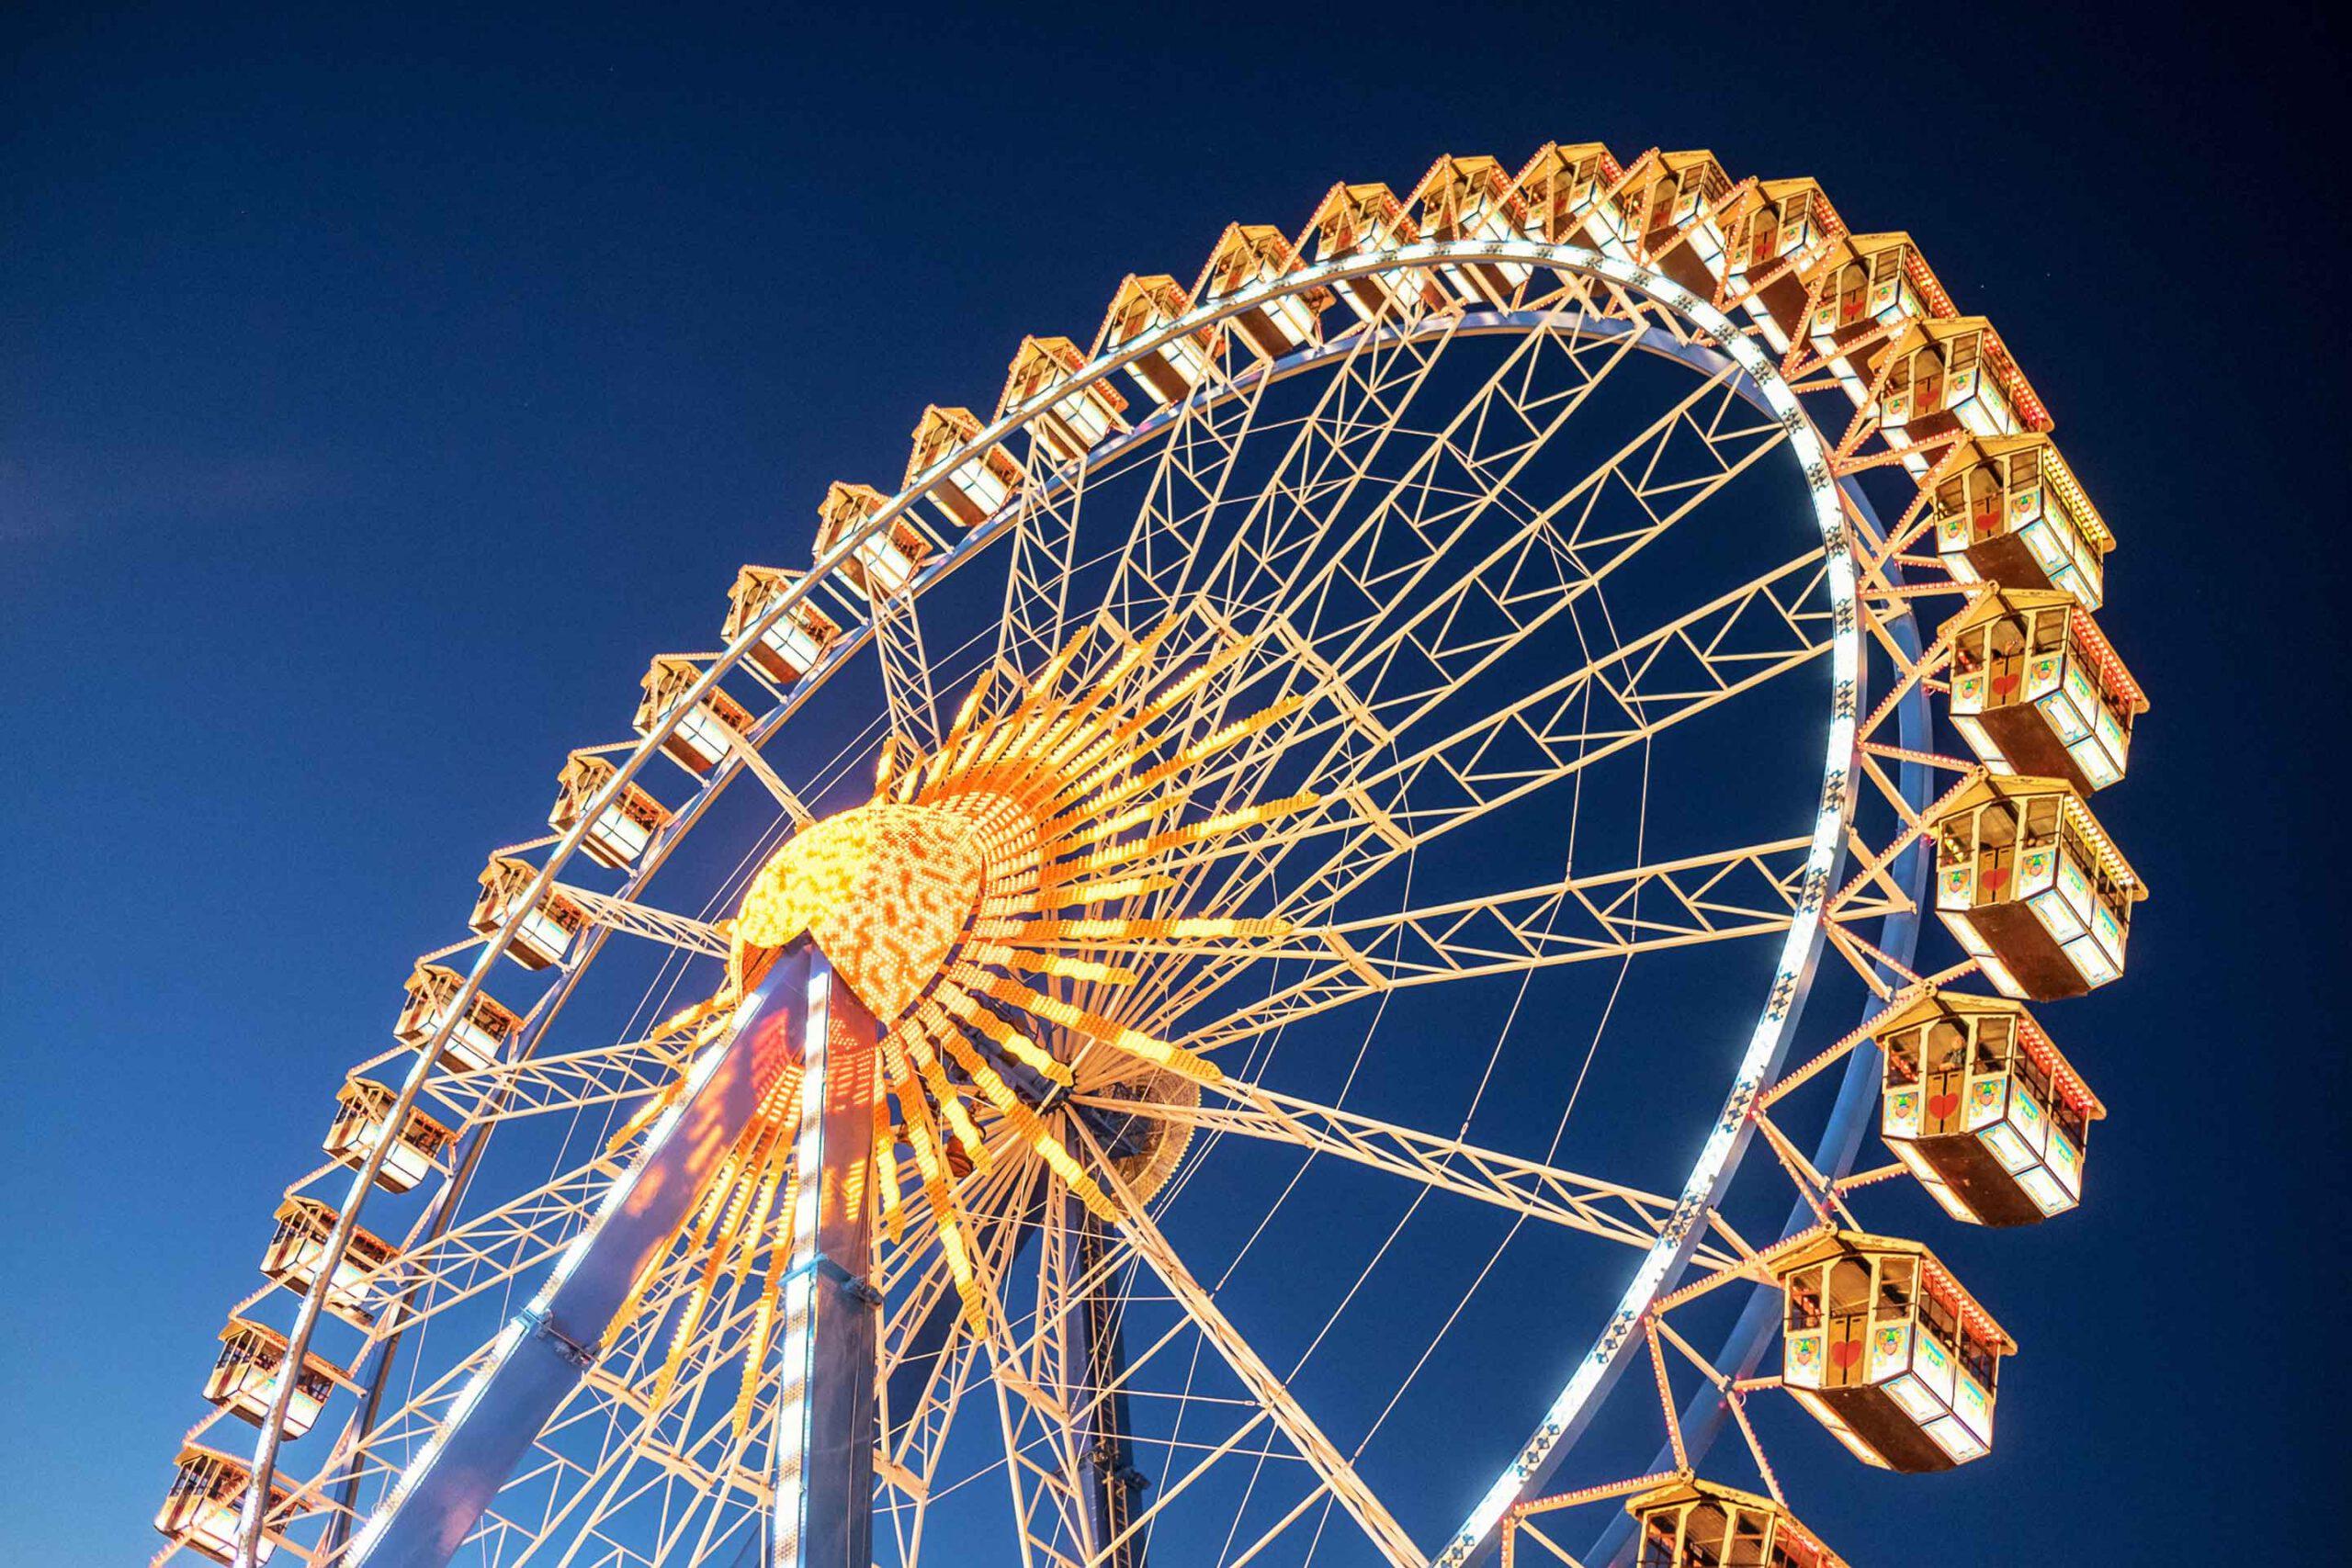 7 Tips for Capturing Striking Night Photos